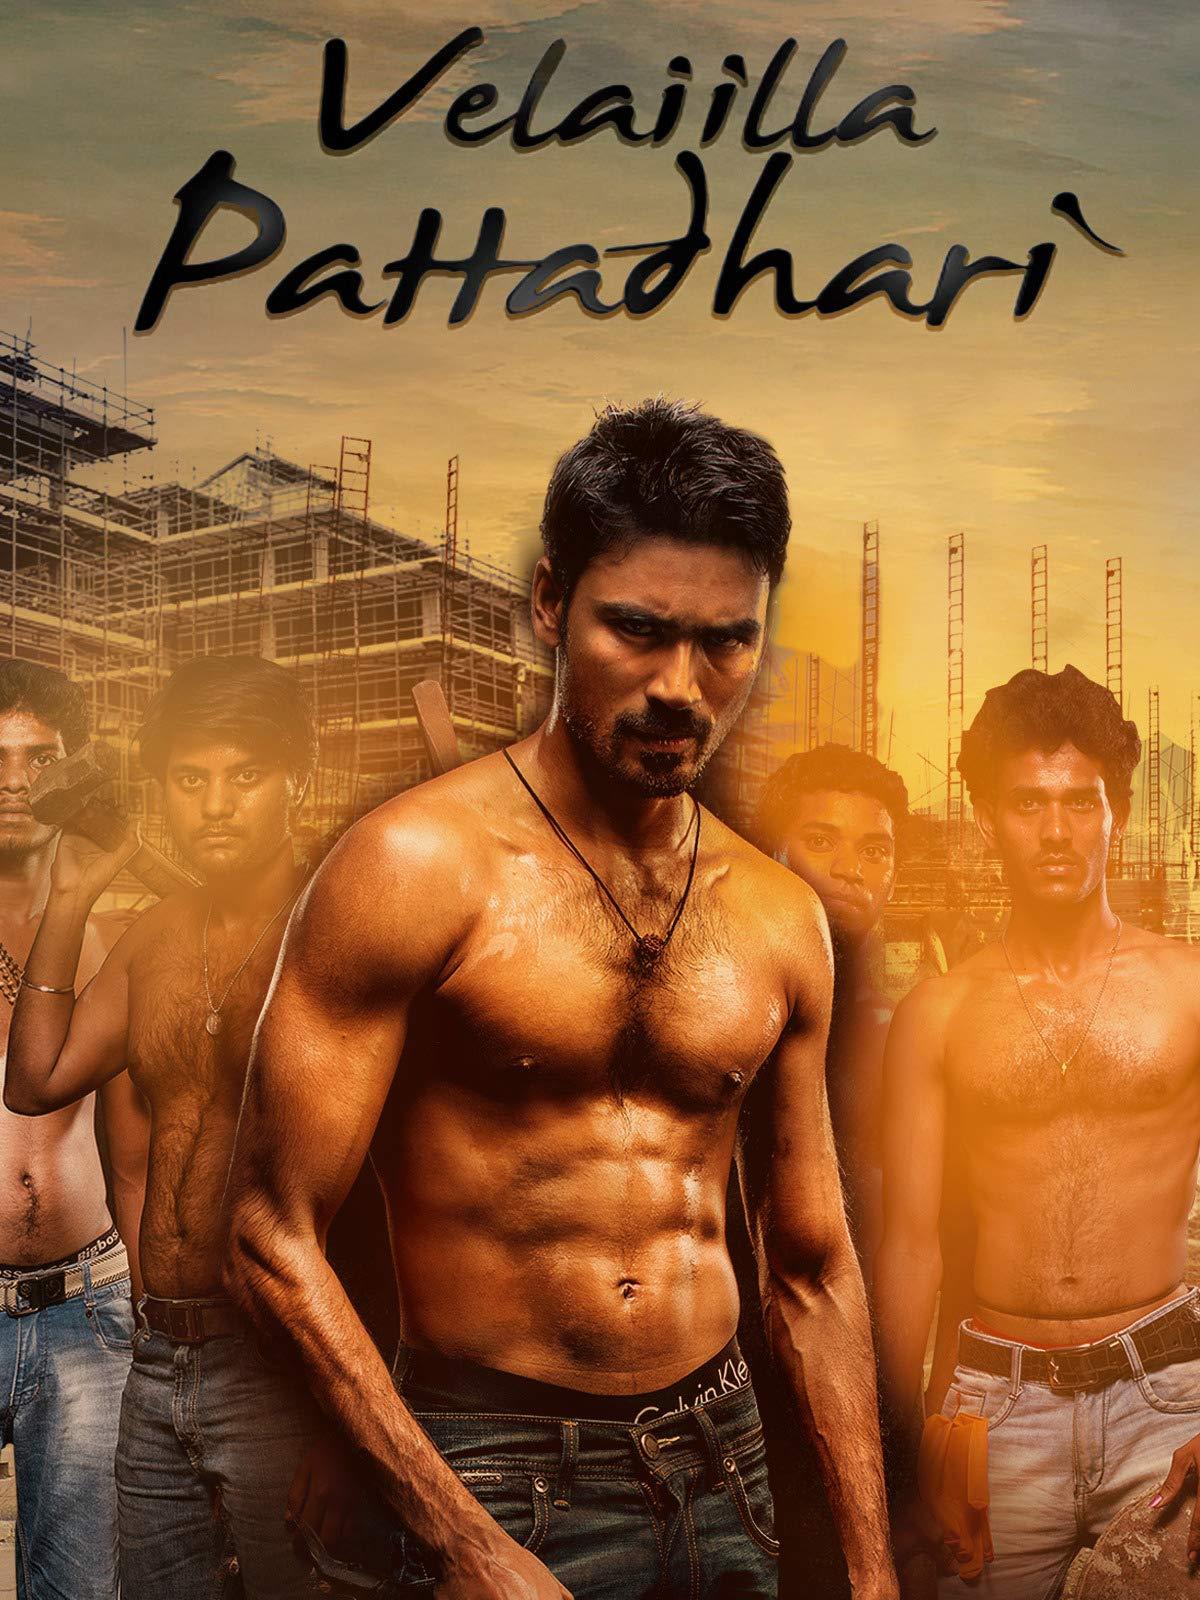 Velaiyilla Pattathari (VIP) 2014 Hindi Dual Audio 450MB UNCUT HDRip Download